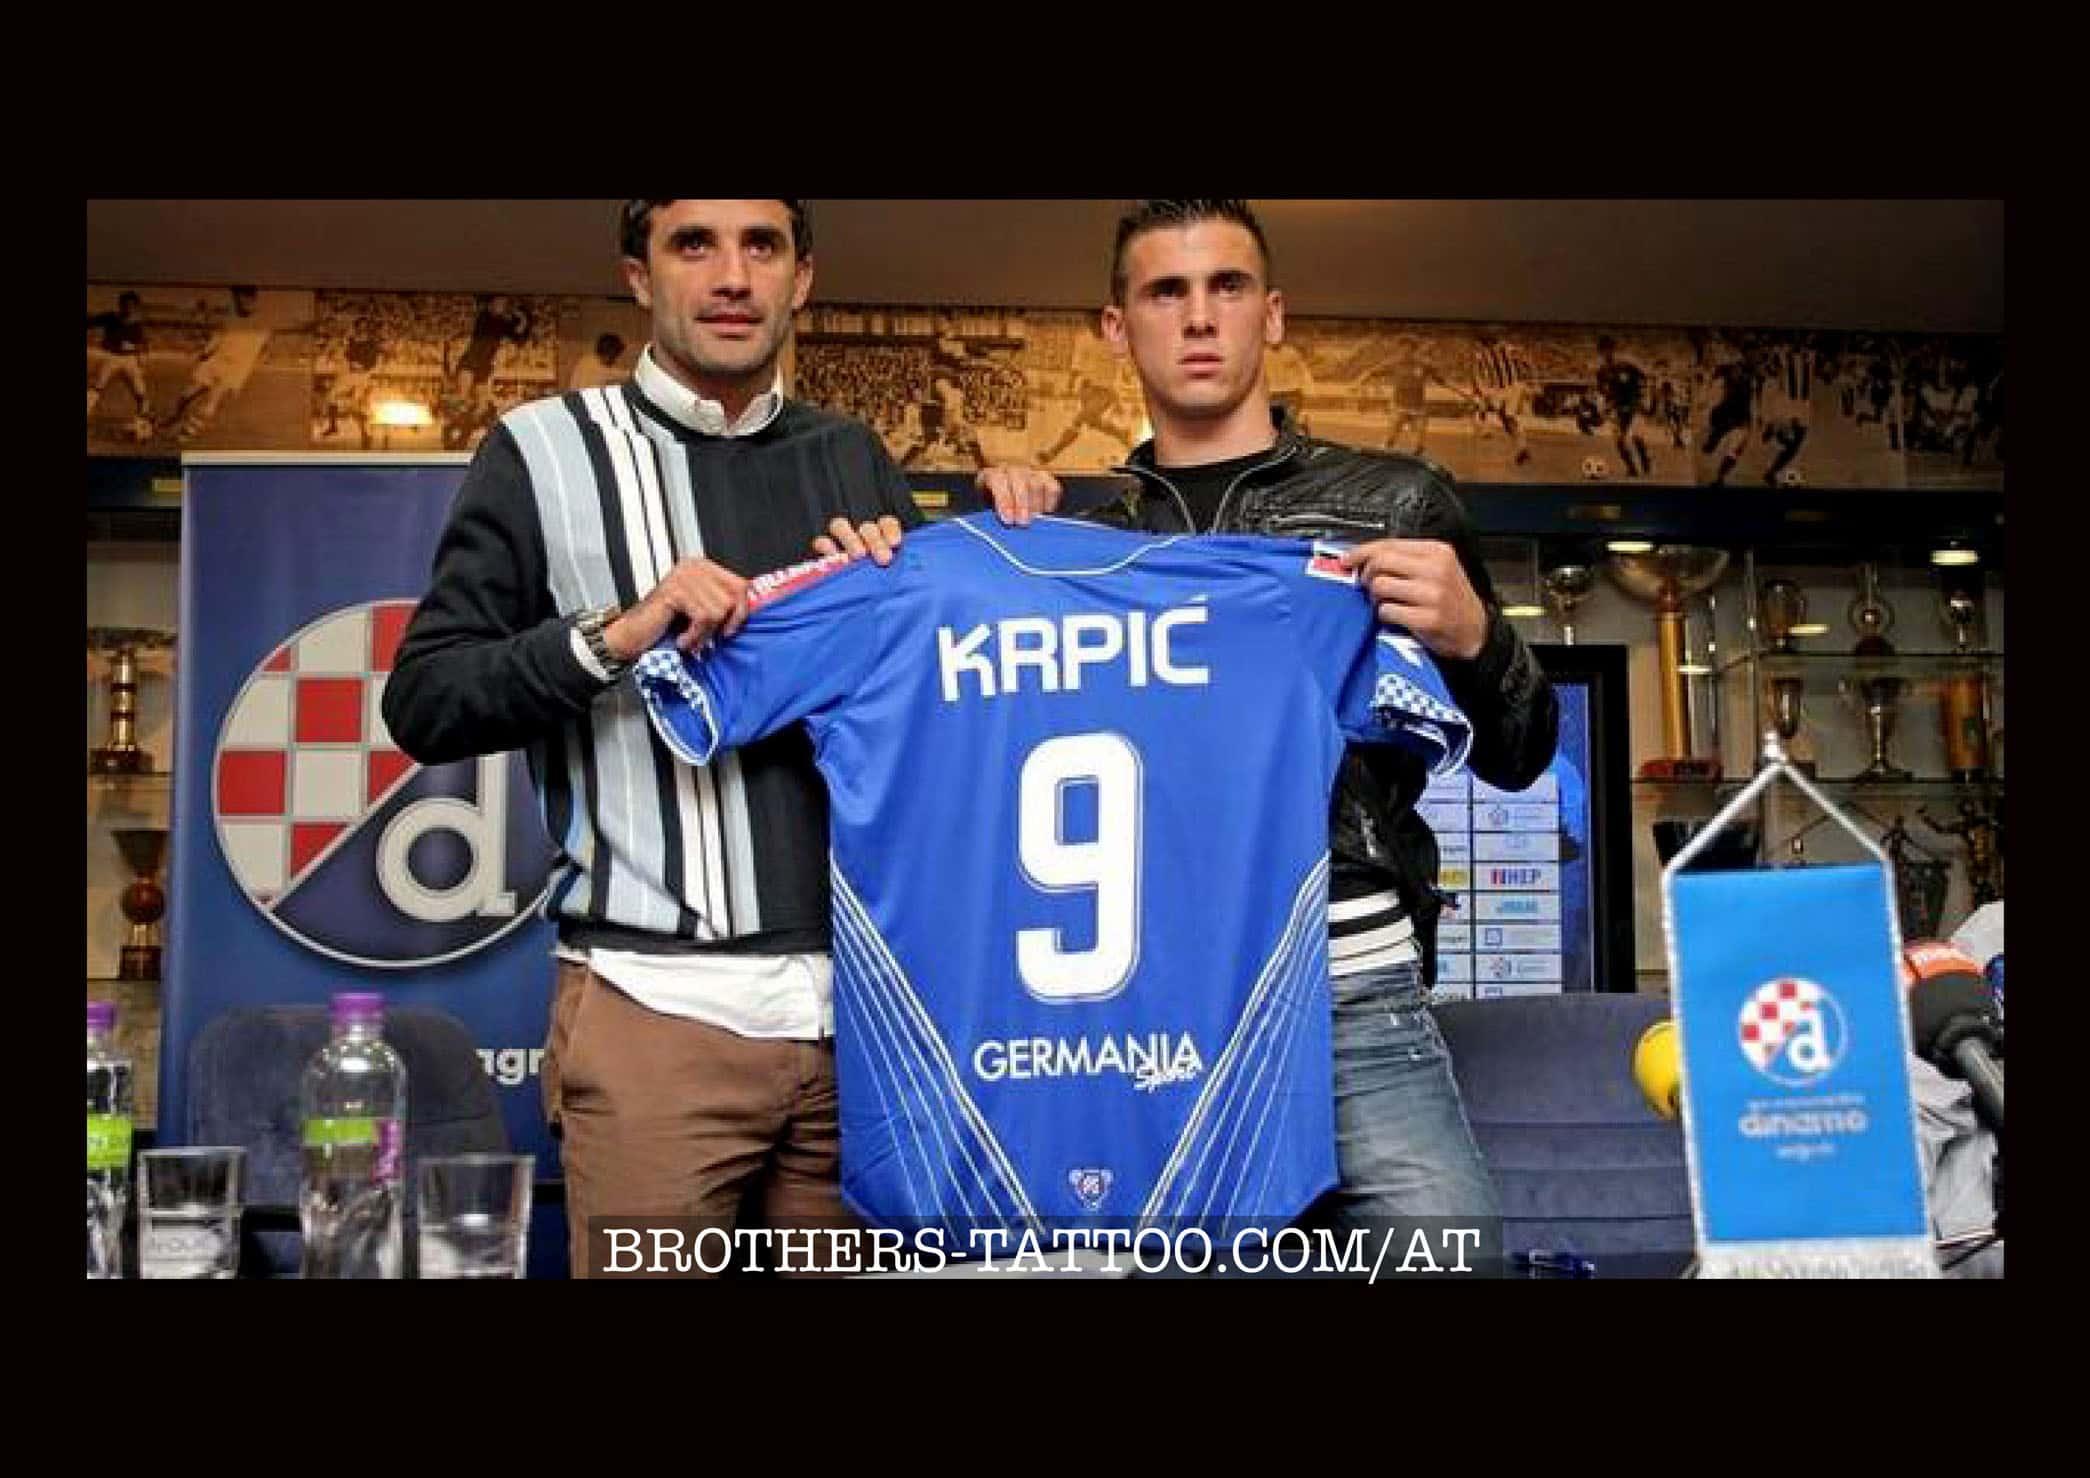 Sulejman Krpic mit Fussballtrikot